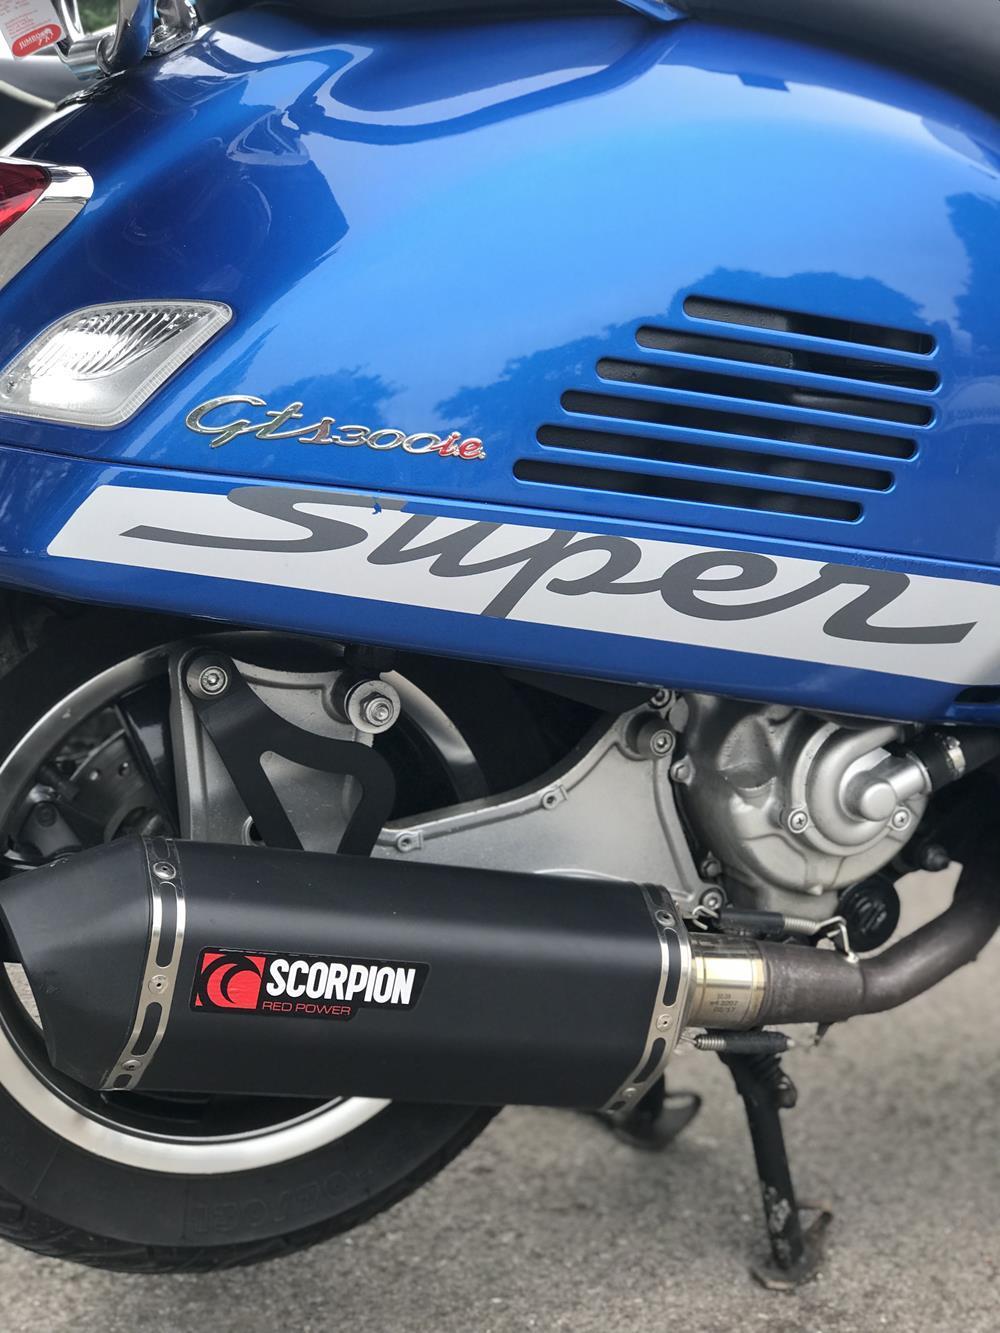 Vespa GTS Scorpion exhaust